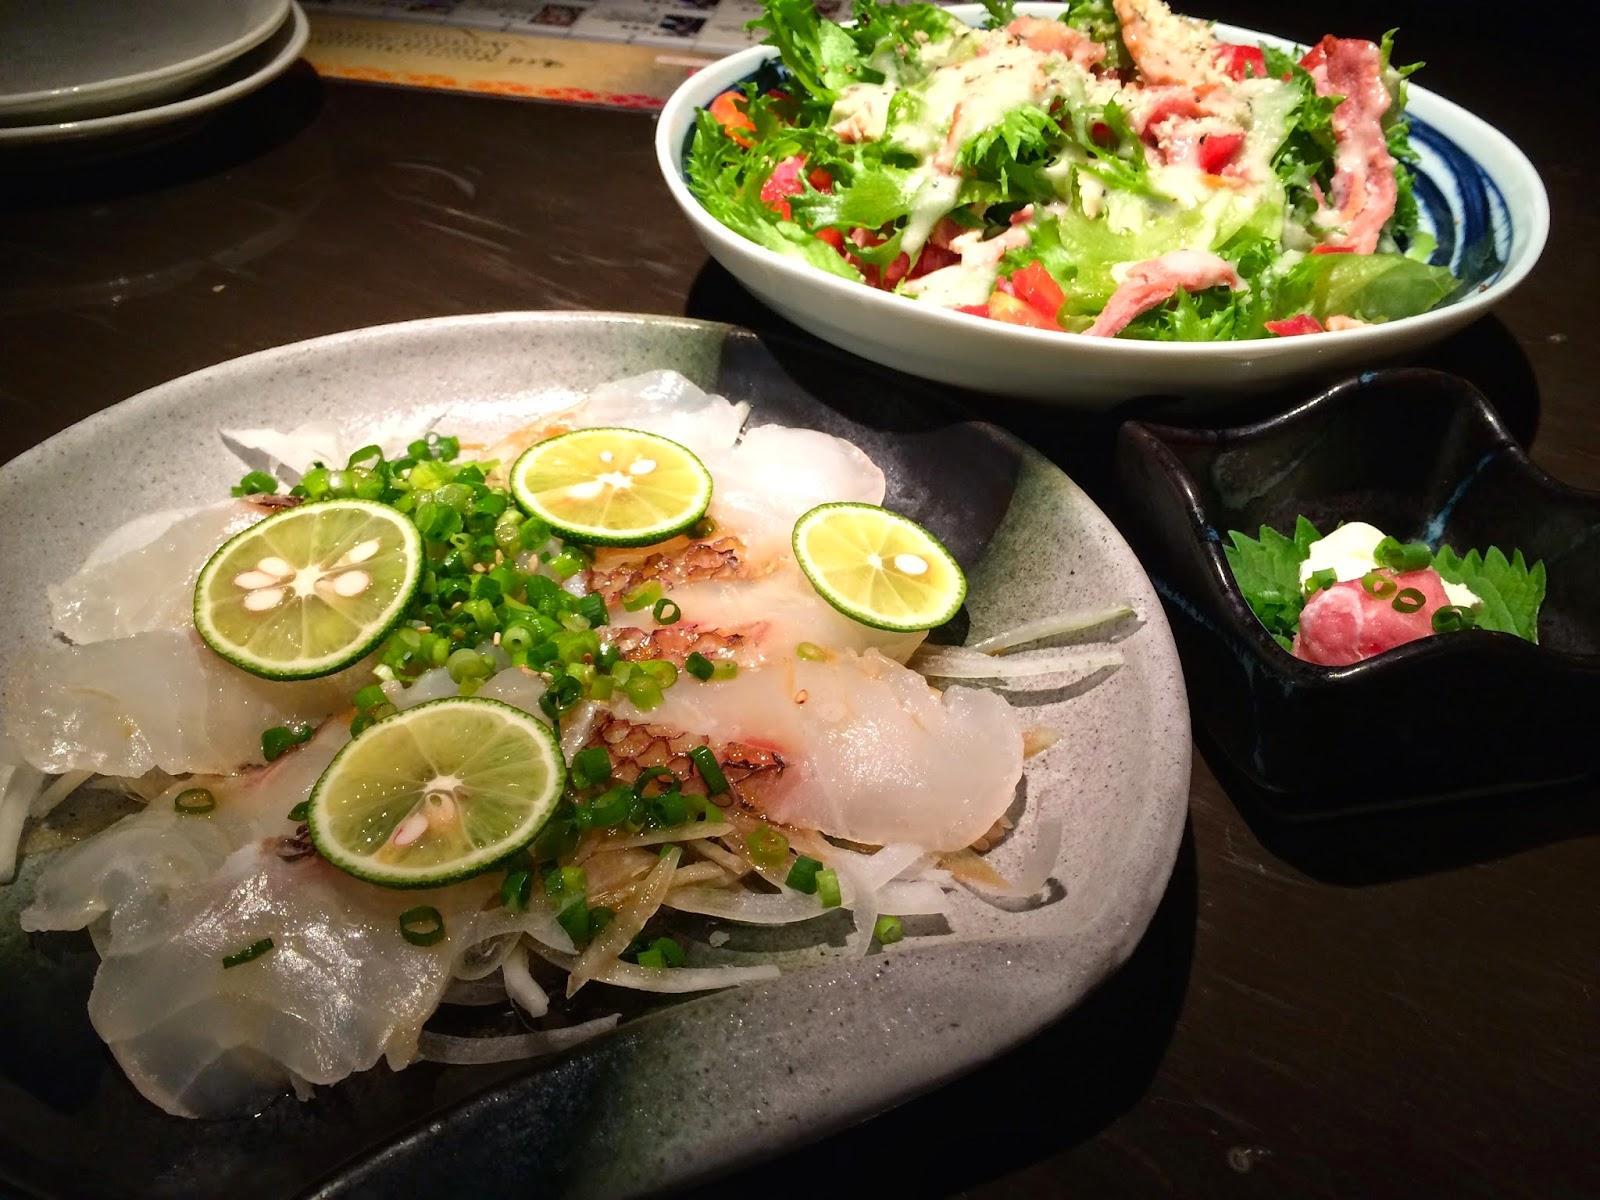 Shinjyuku Awaodori restaurant shinjuku tokyo awa odori japanese culture entertainment restaurant 新宿阿波踊り